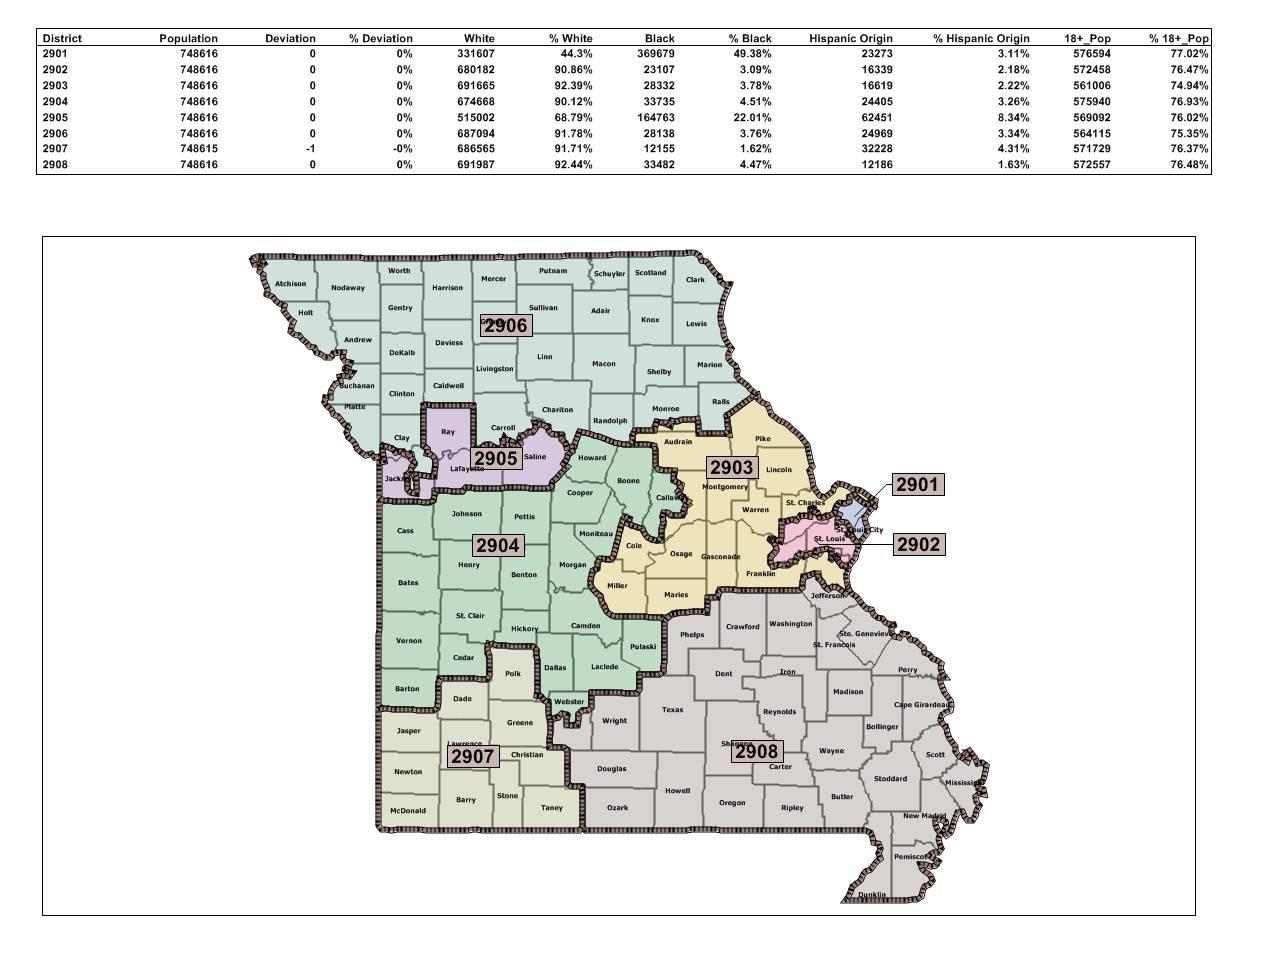 Senate Version Of Redistricting Map Cuts Congressman From ...